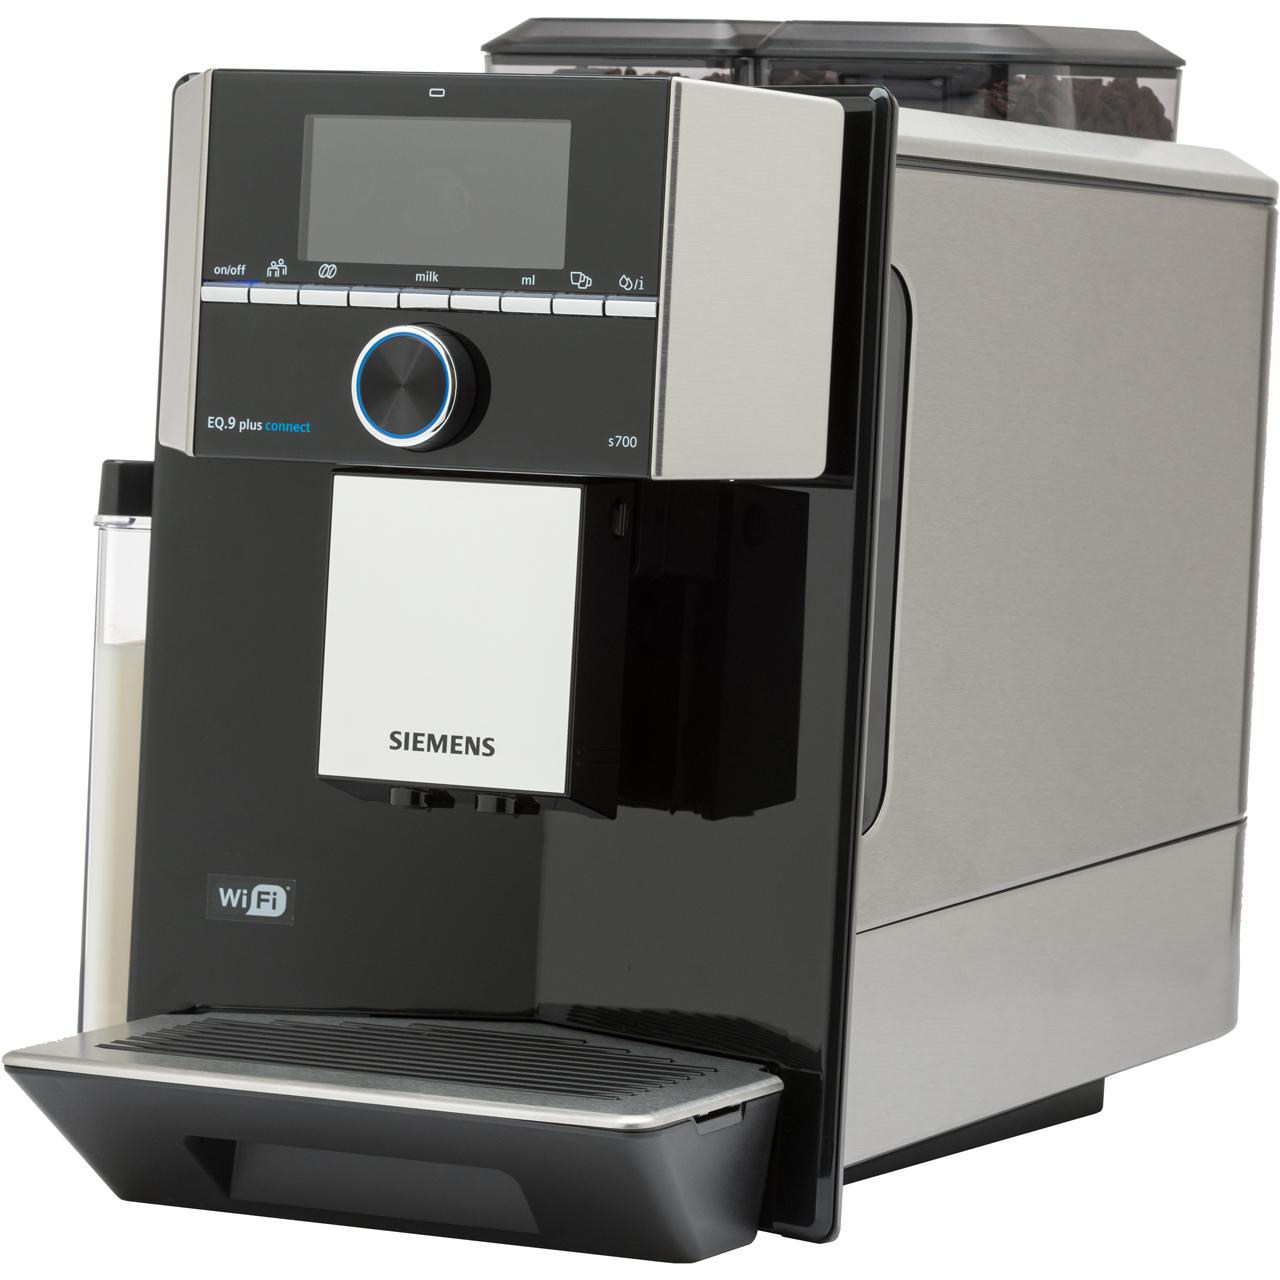 Siemens Eq9 Ti9573x9rw Bean To Cup Coffee Machine Black Stainless Steel